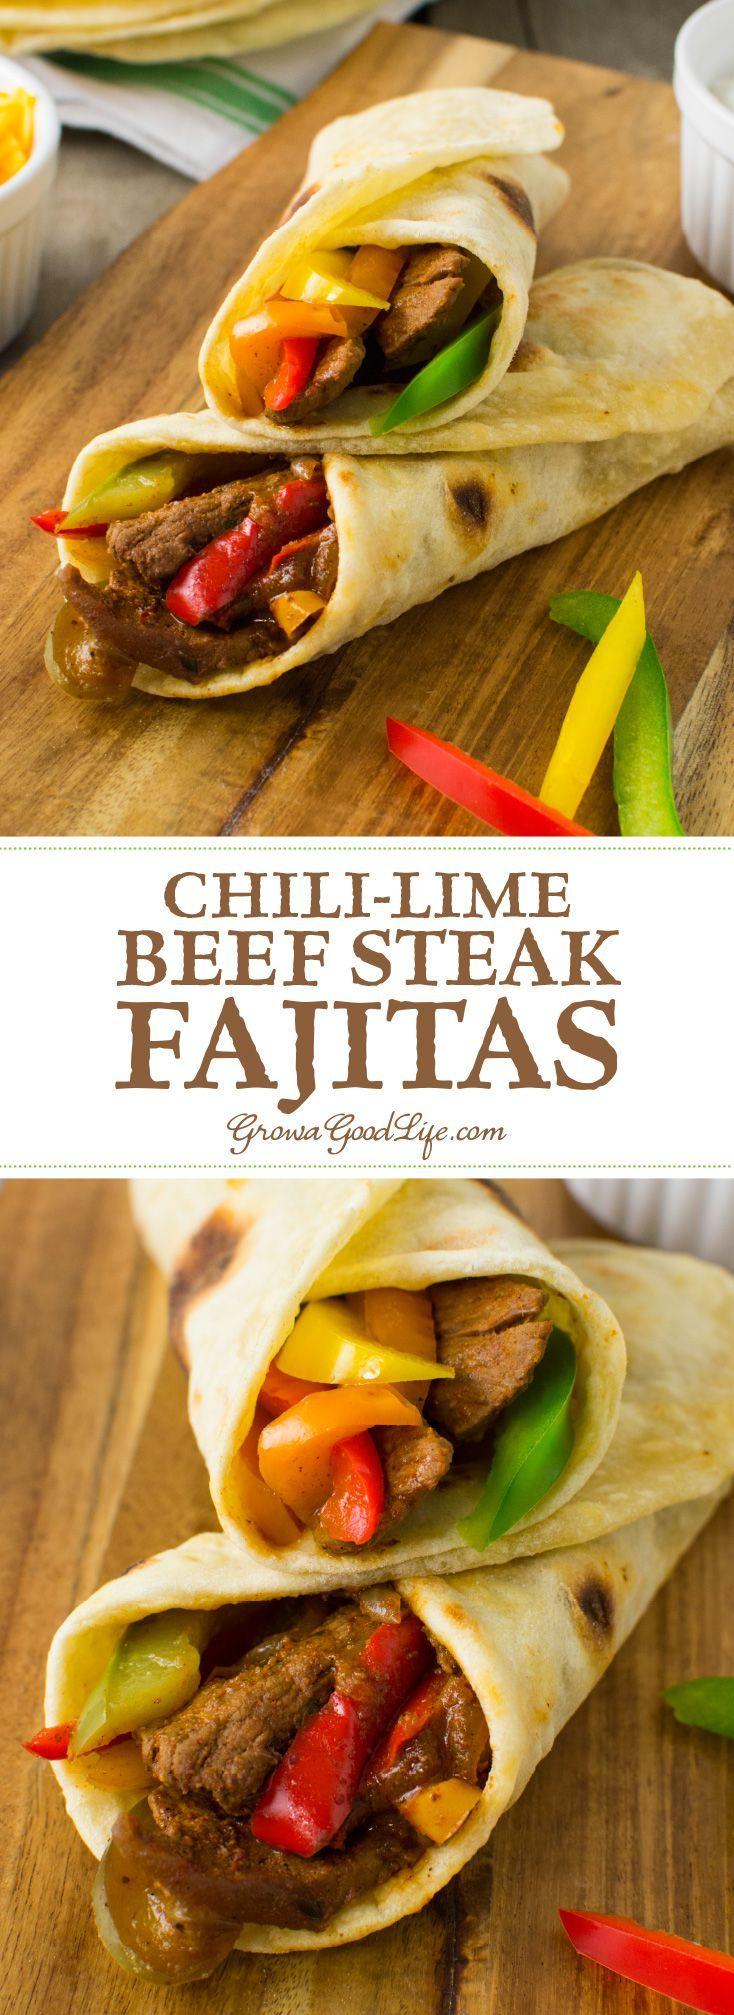 chili lime beef steak fajitas steak fajitas beef steak sandwich ...